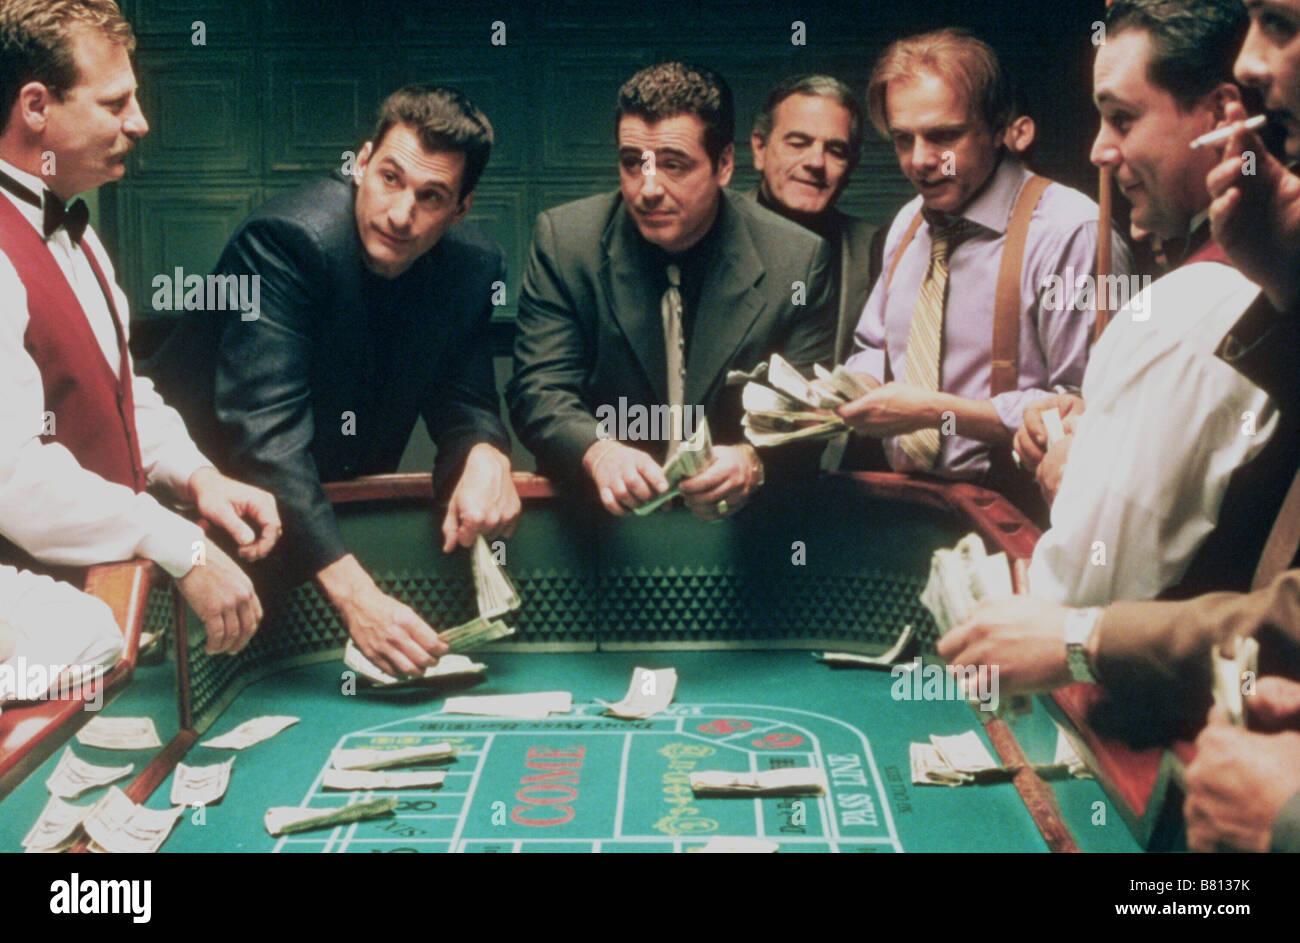 The Sopranos   TV-Series 1999-2007 USA 2004 Season 5  Created by David Chase Robert Funaro, Joe Pantoliano - Stock Image